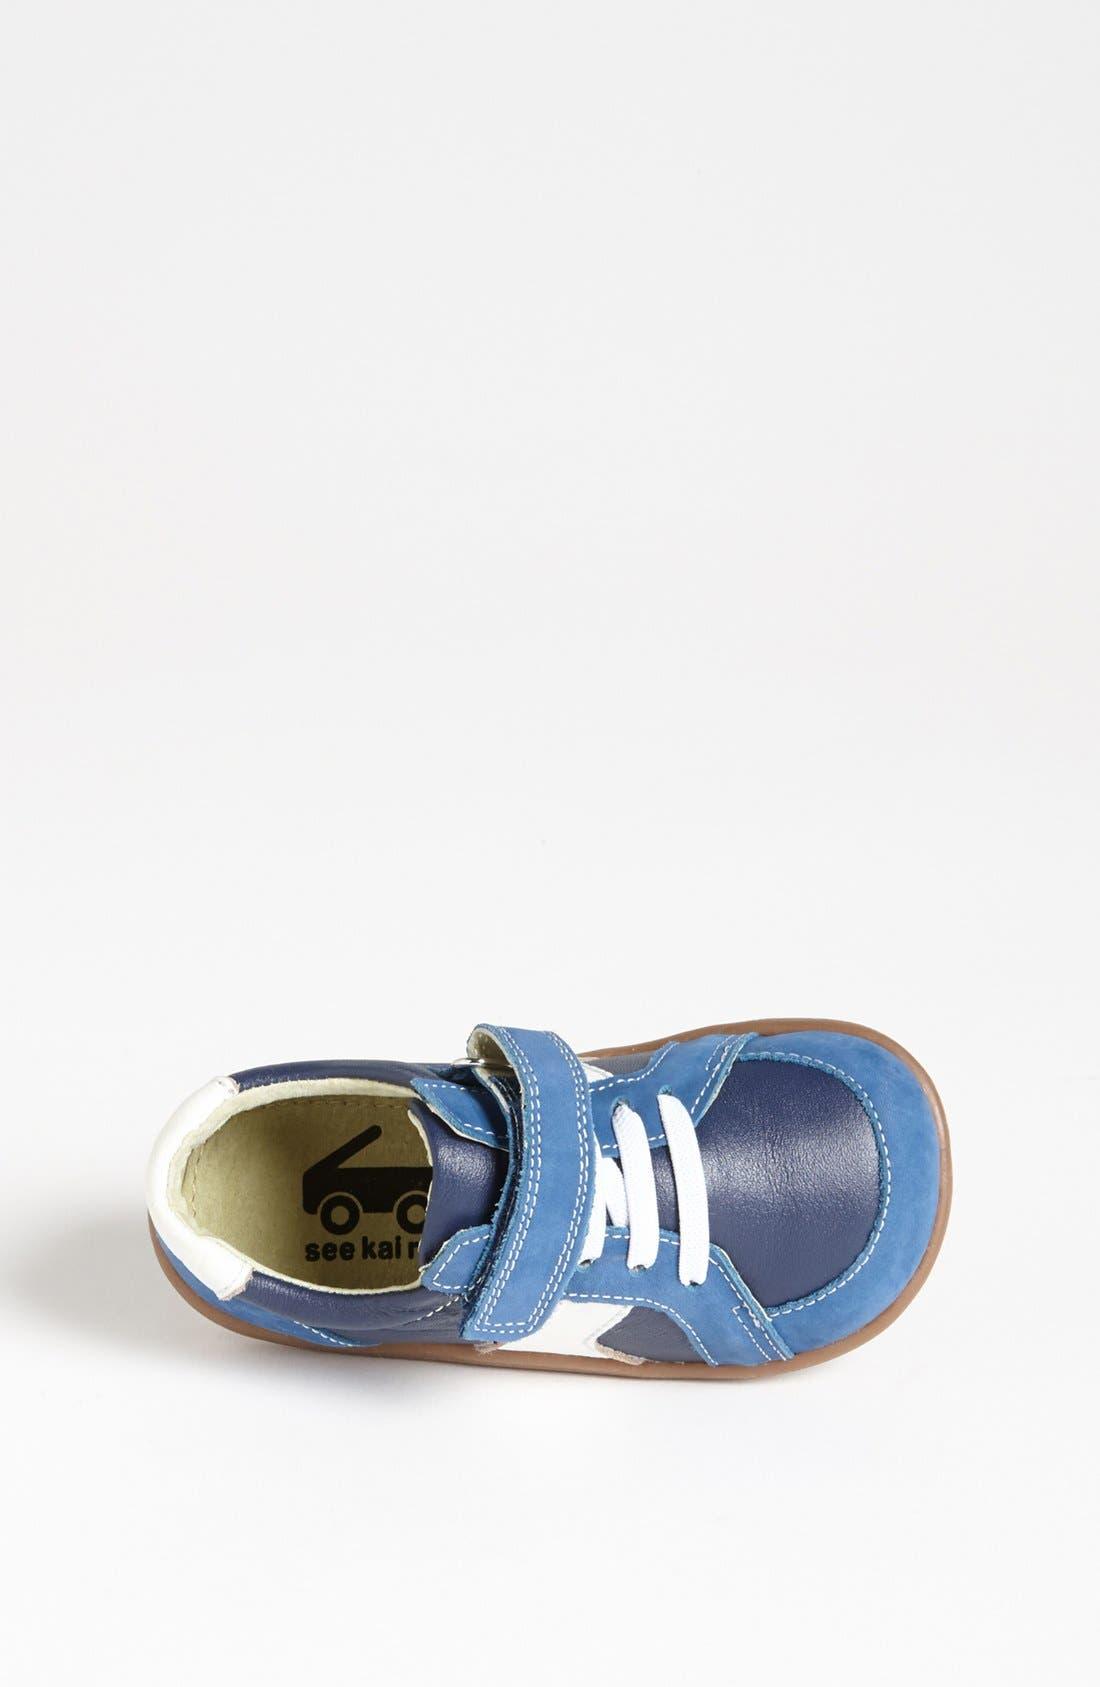 Alternate Image 3  - See Kai Run 'Connor' Sneaker (Baby, Walker & Toddler)